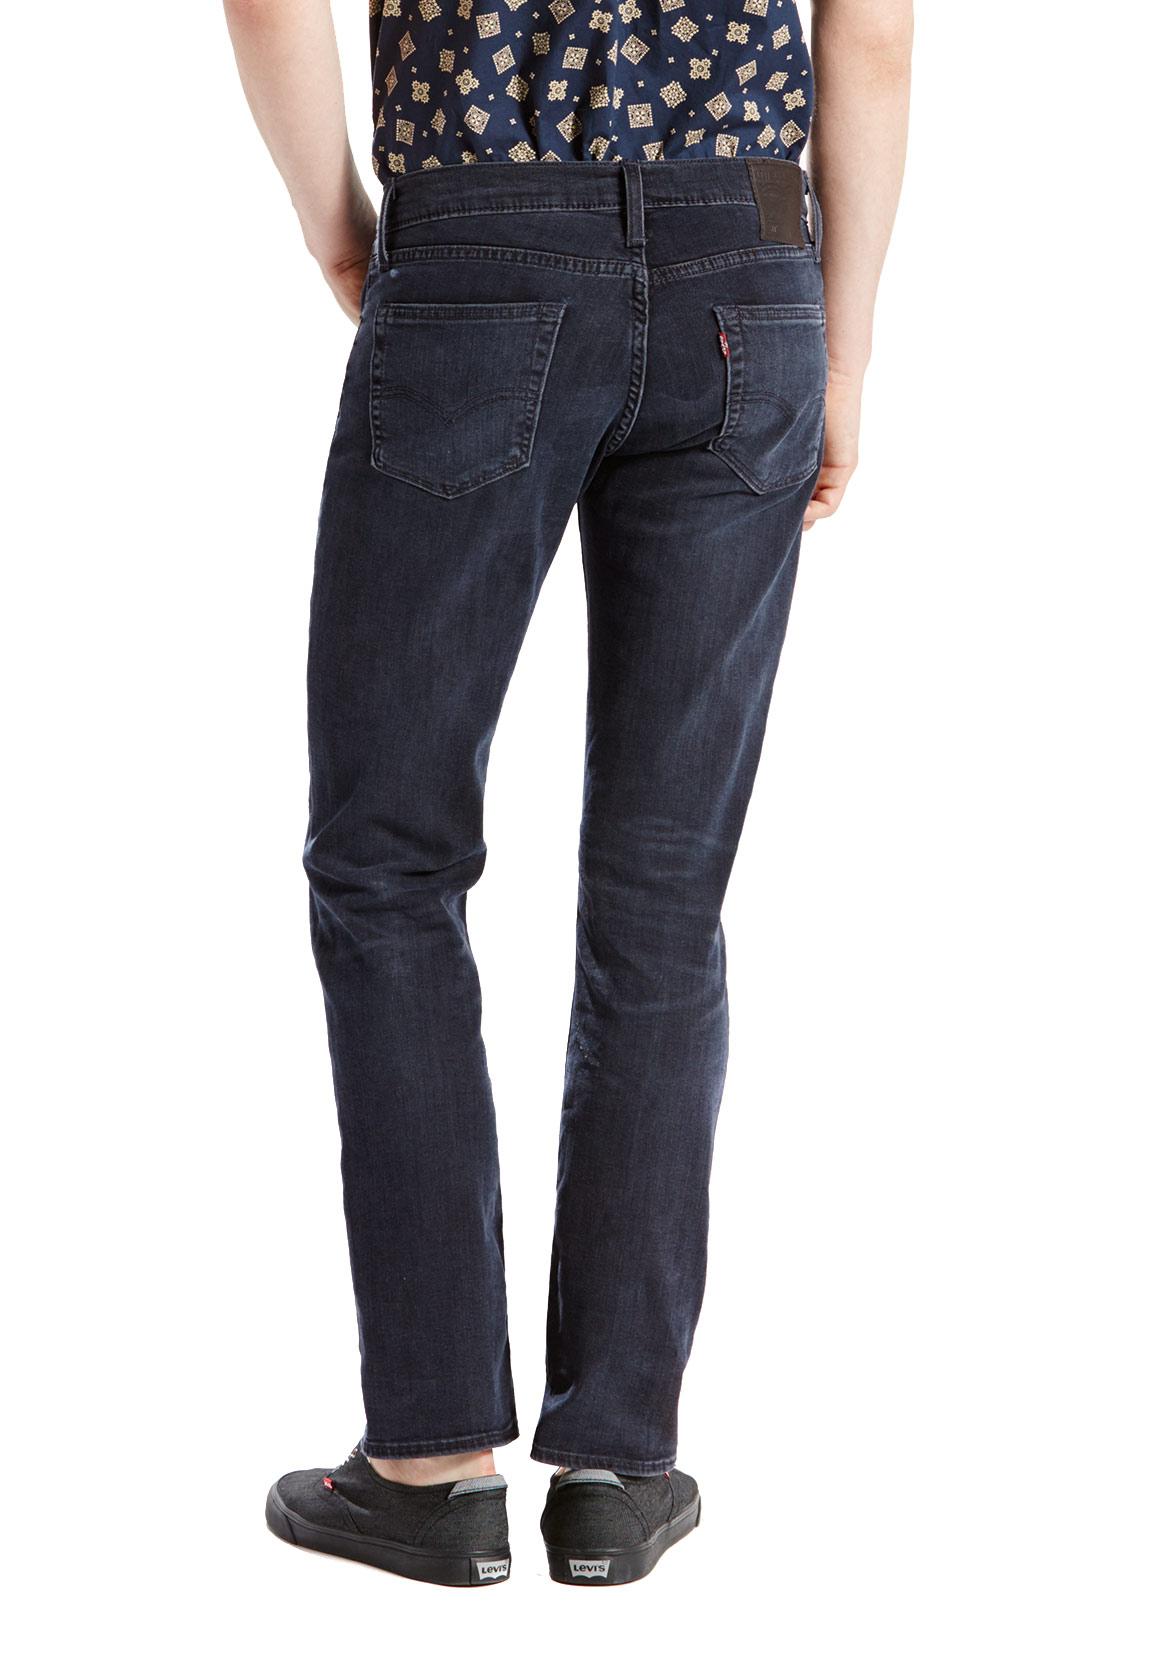 100% Qualität wie kommt man San Francisco Levi´s Herren Jeans 511 SLIM FIT 04511-2090 Dunkelblau